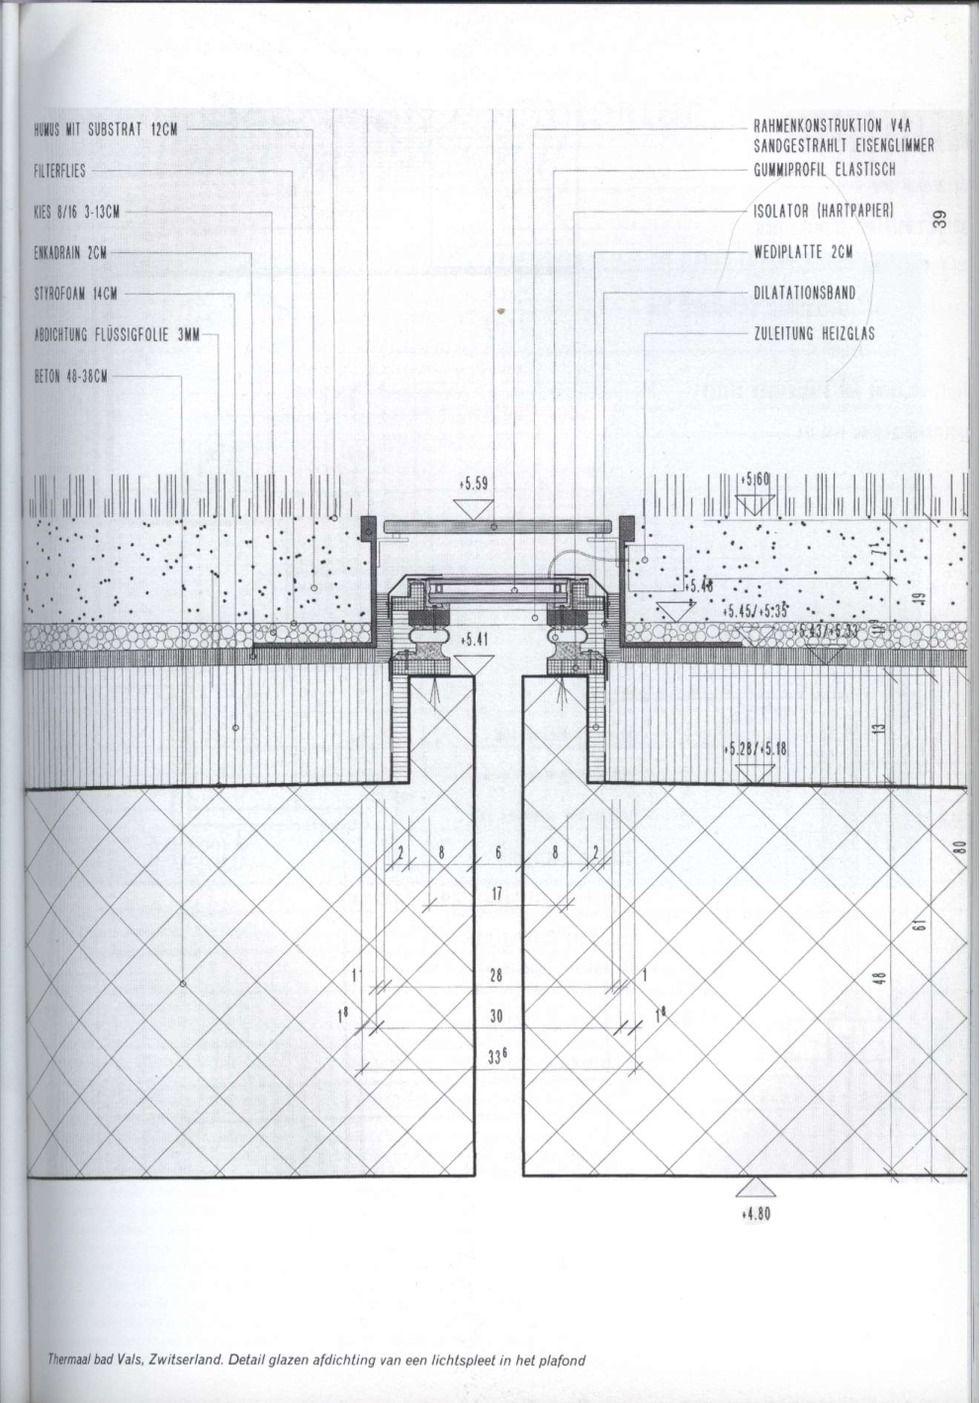 Peter Zumthor - Thermal Vals Detail Http://Www.Oasejournal.Nl/En